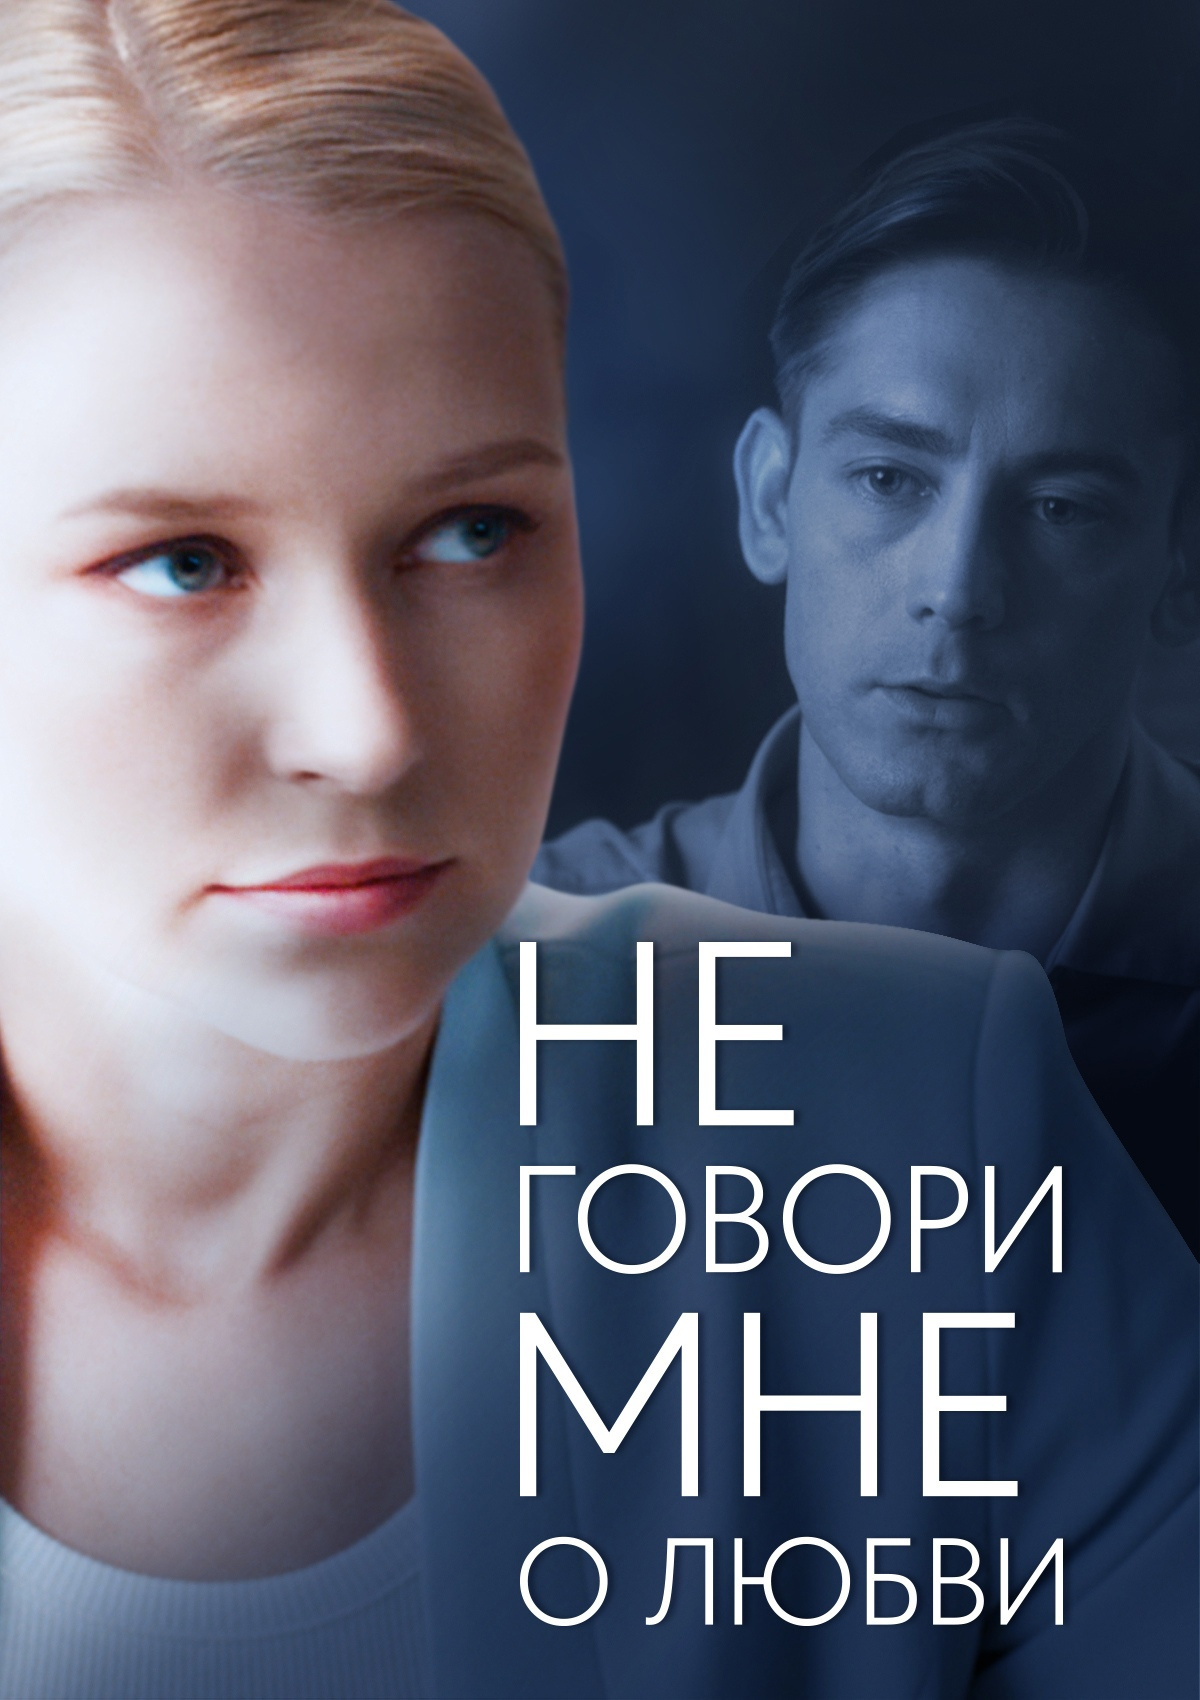 Мелодрама «He гoвopи мнe o любви» (2020) 1-4 серия из 4 HD